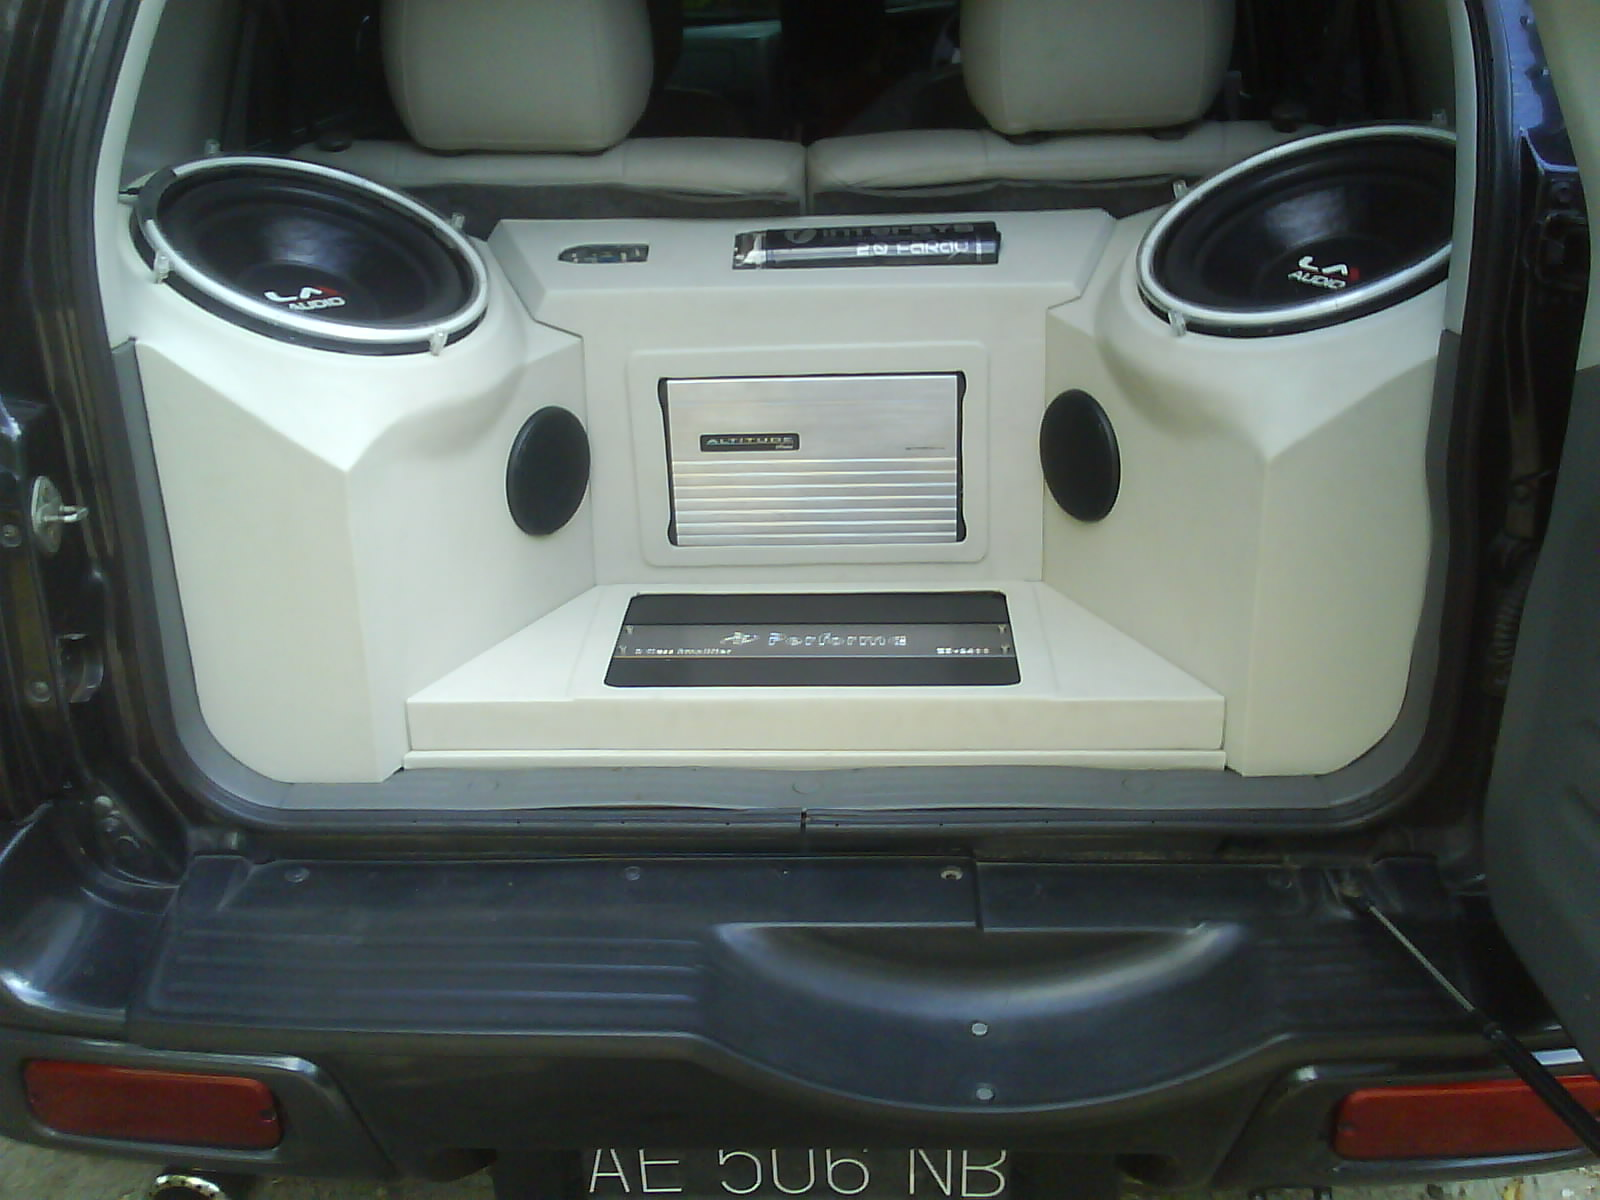 Cara Pengoperasian Audio All New Kijang Innova Trunk Lid Grand Avanza Upgrade Your Car Starzcarz News Review